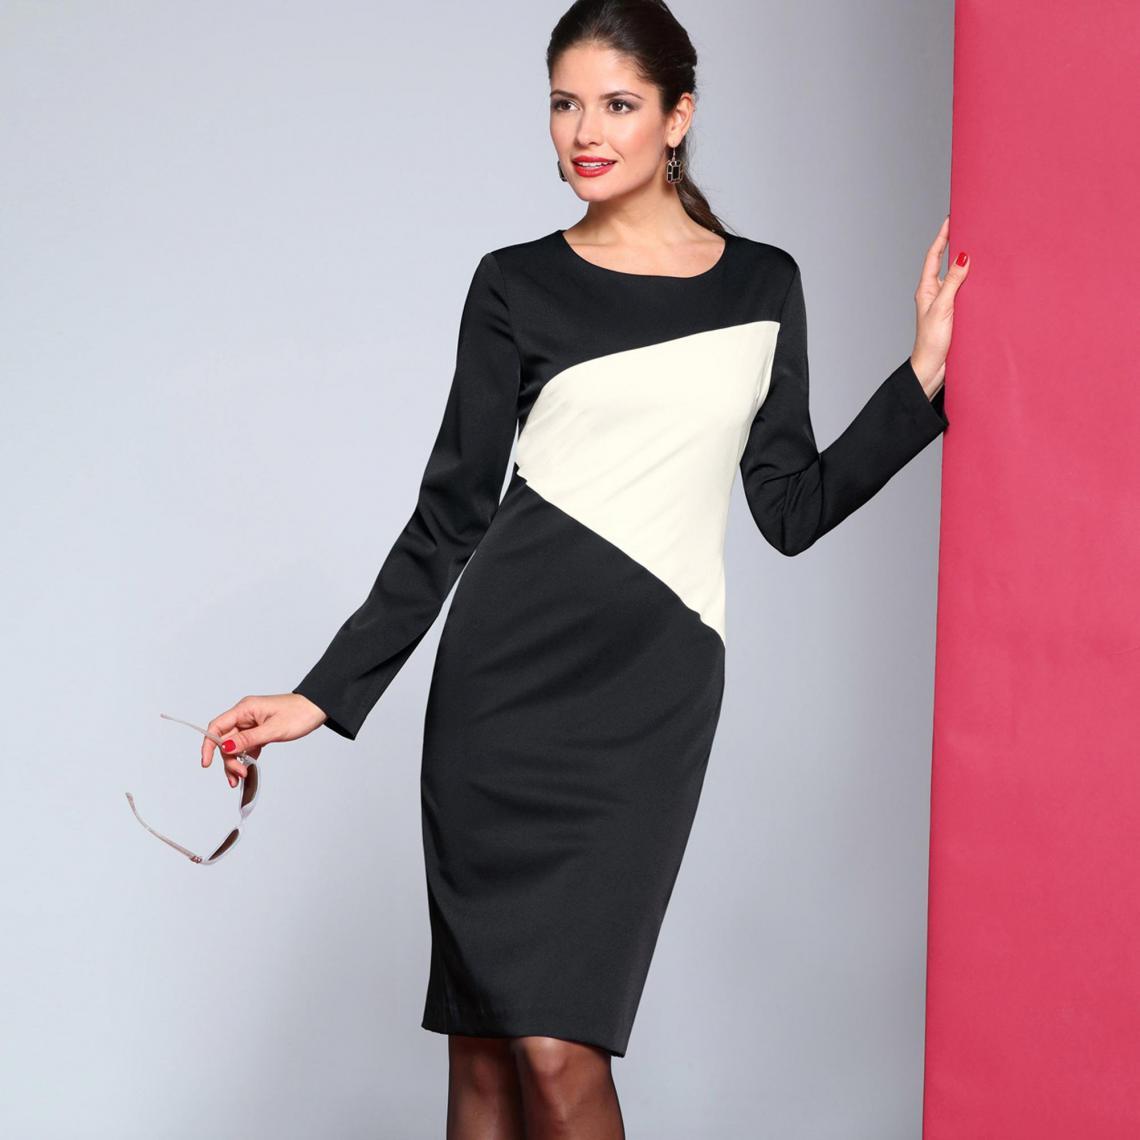 Robe habillée courte femme - LOT - 3 SUISSES - Modalova